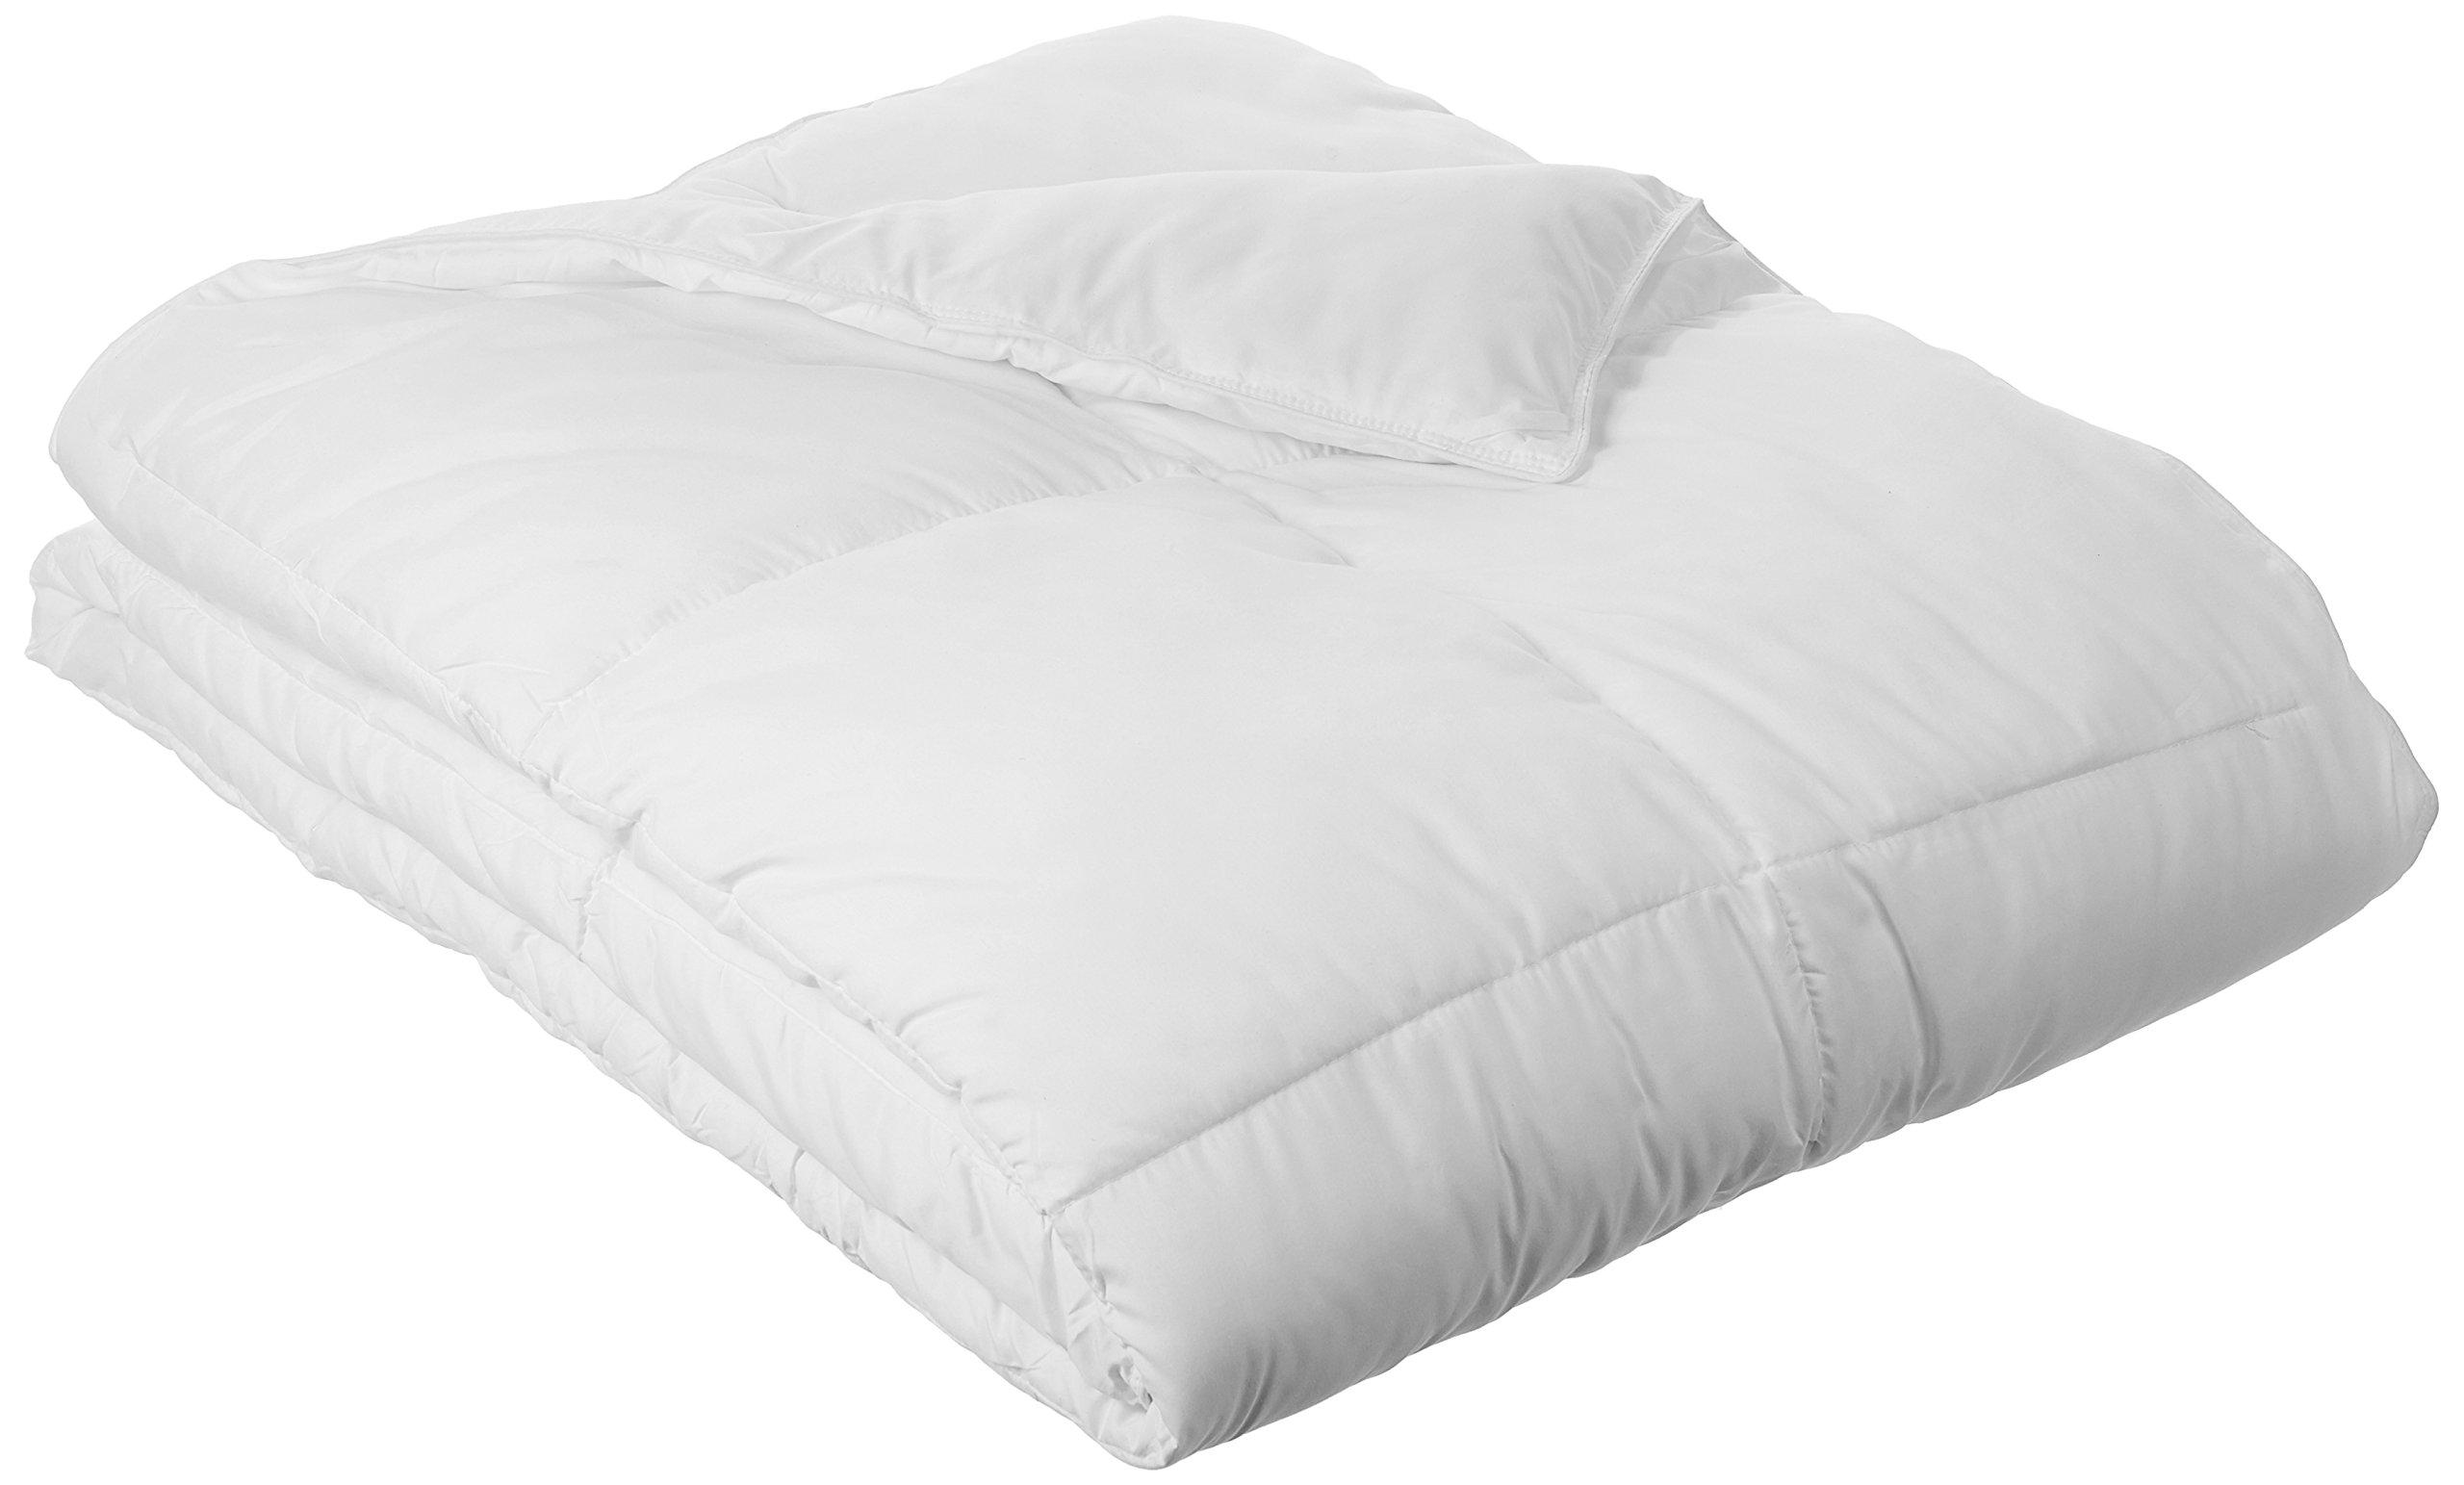 AmazonBasics Down Alternative Bed Comforter, King, White